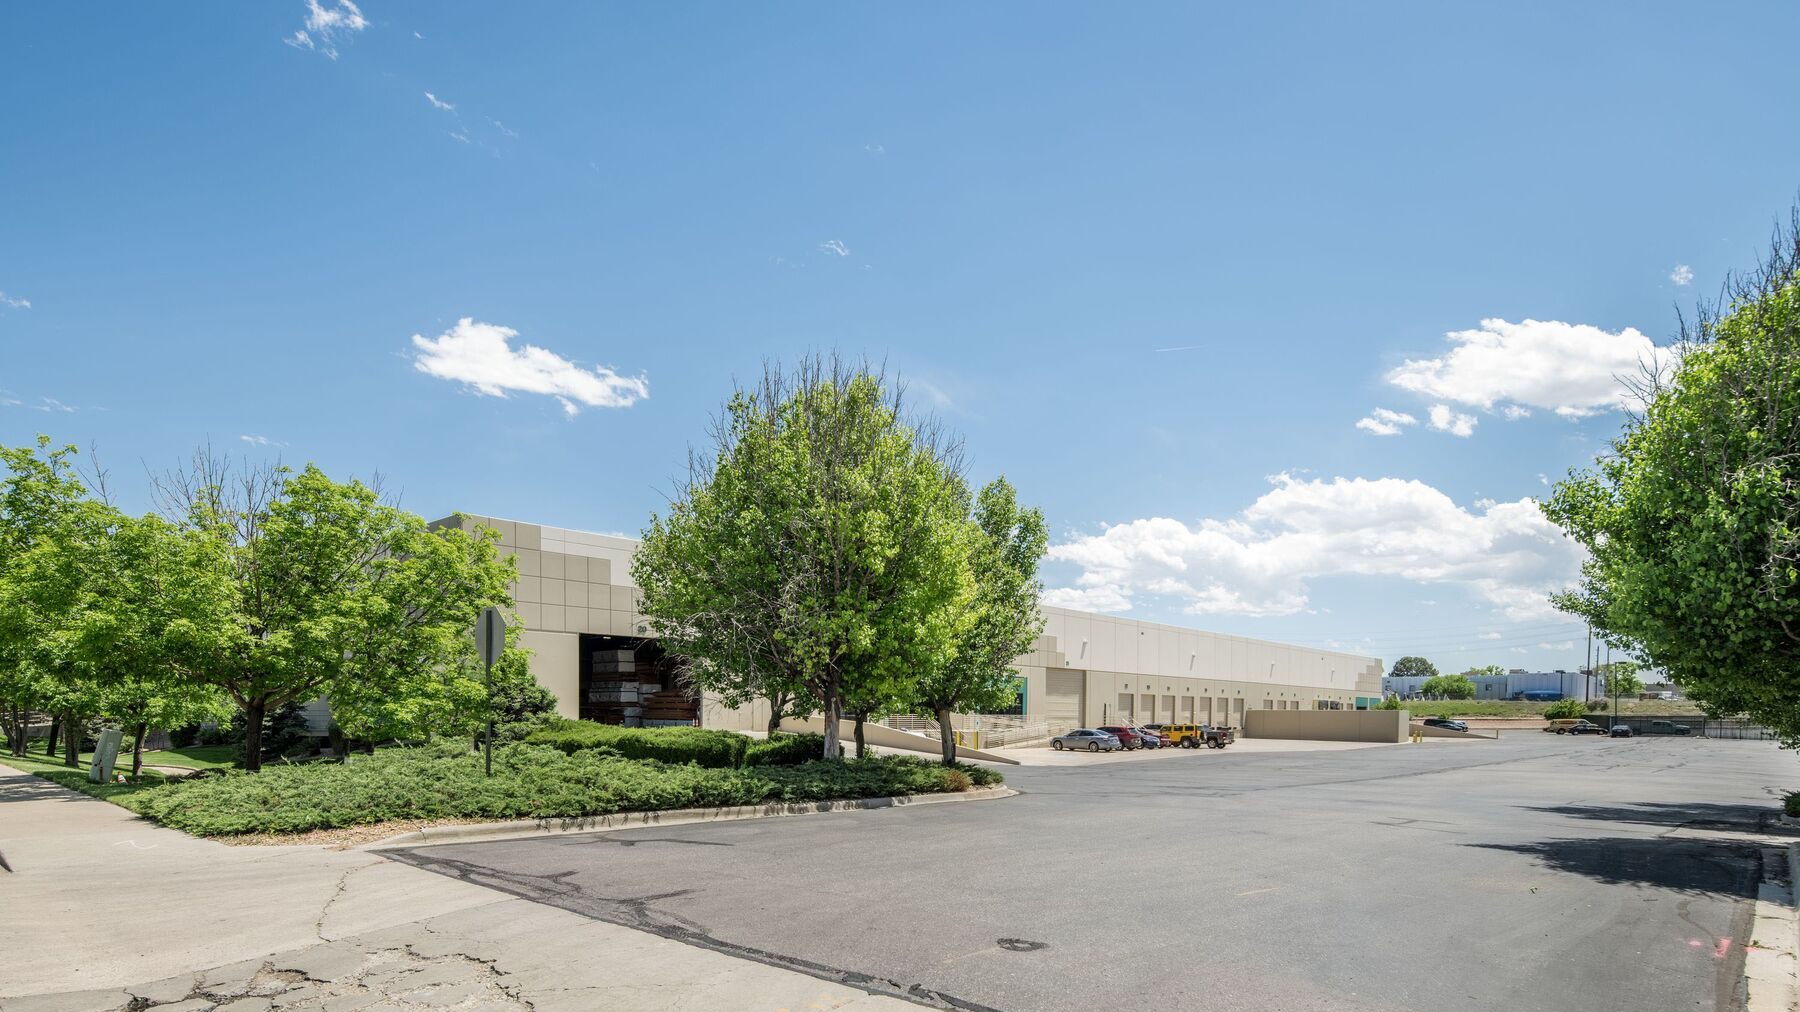 DPM-3000x2400-Denver-2-1-2021-1.jpg